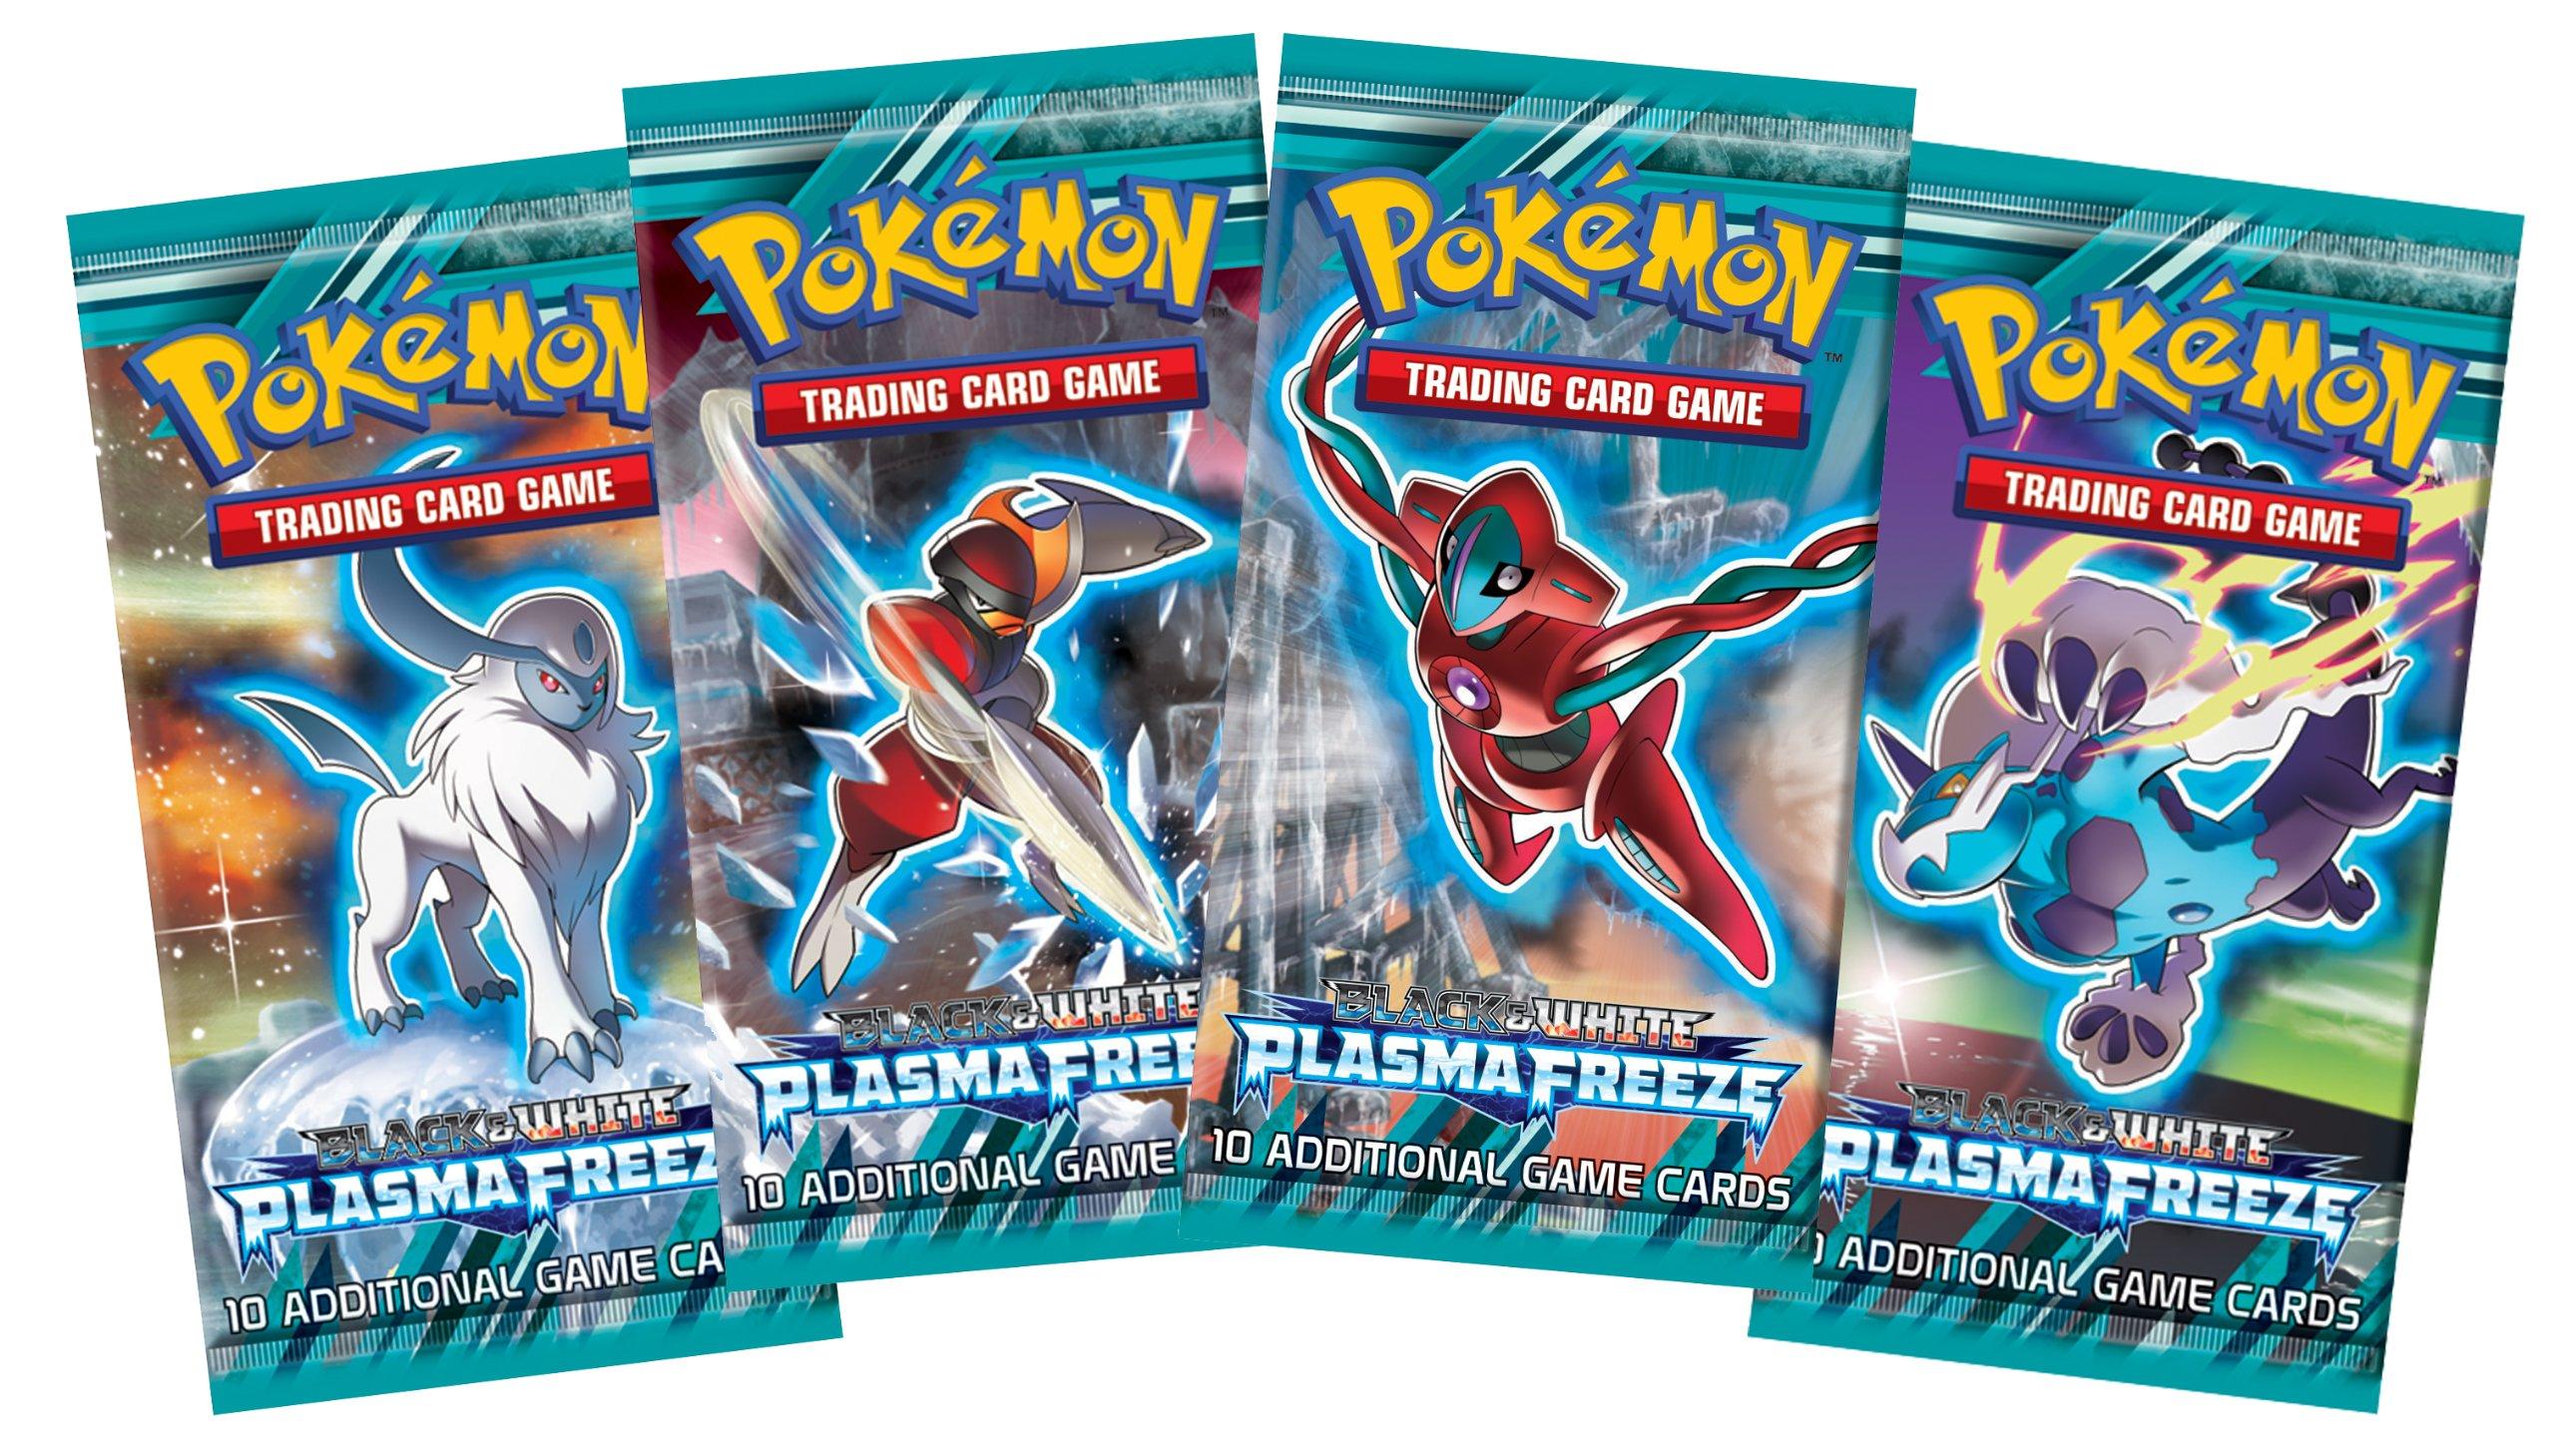 Pokemon Black & White Plasma Freeze Booster Box TCG